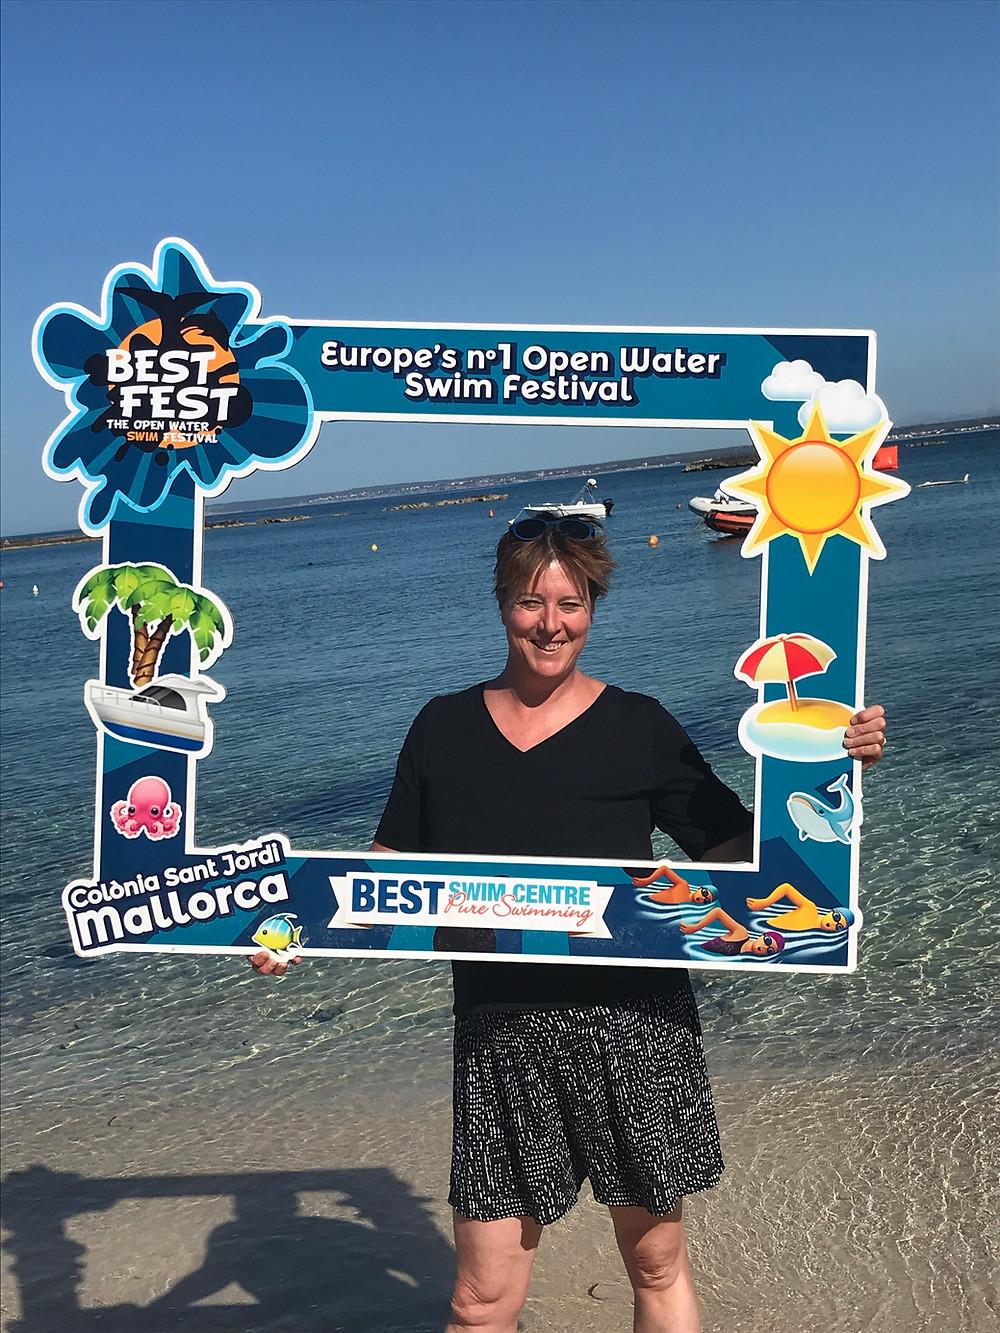 The Best Fest, Europes open water festival